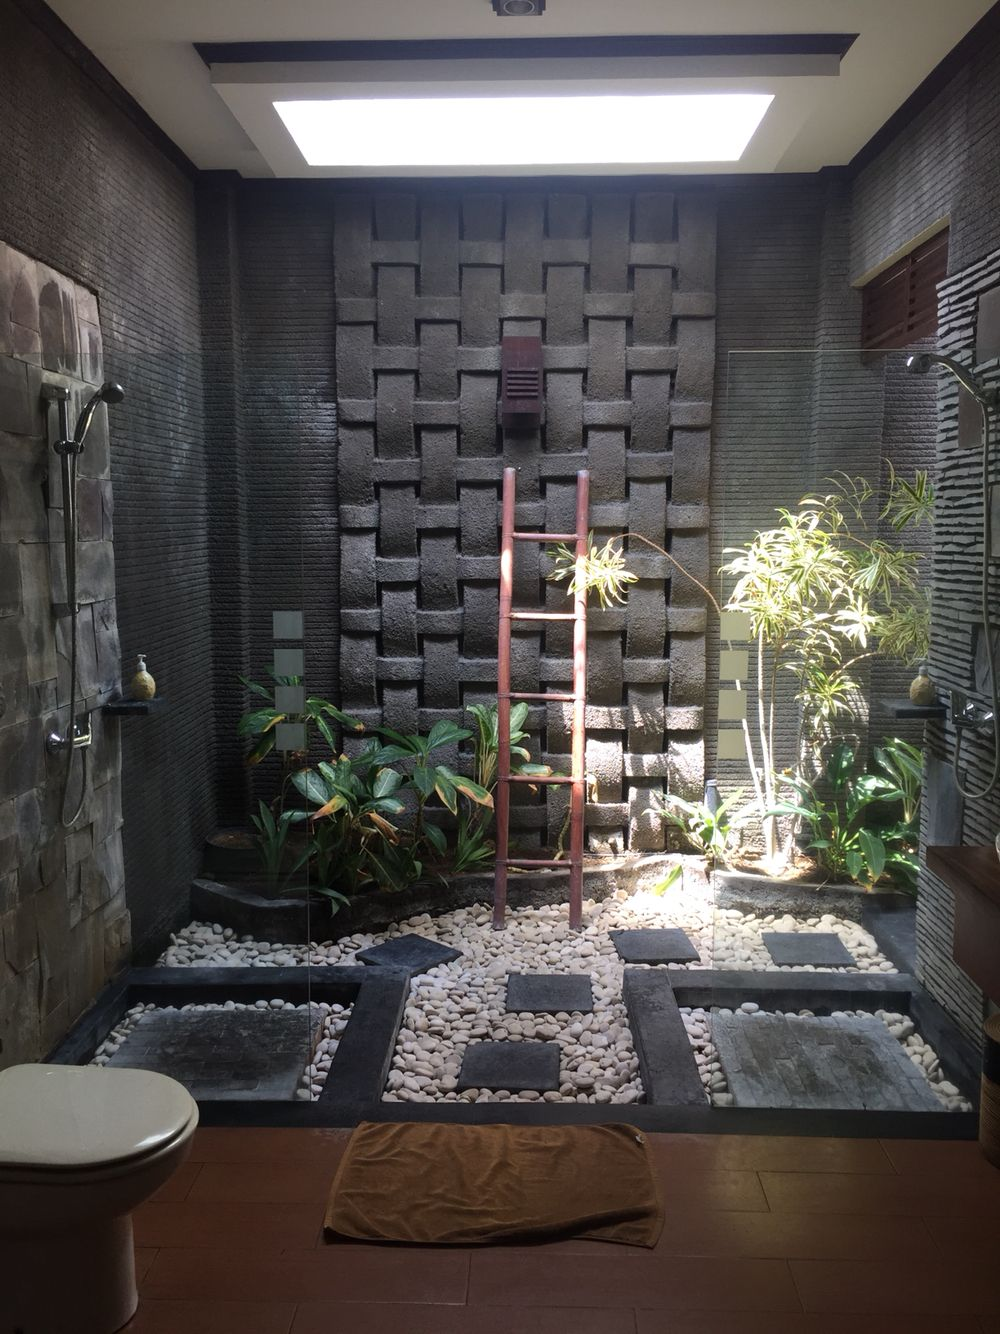 Bali bathroom bathroom toilets pinterest natural for Balinese bathroom design